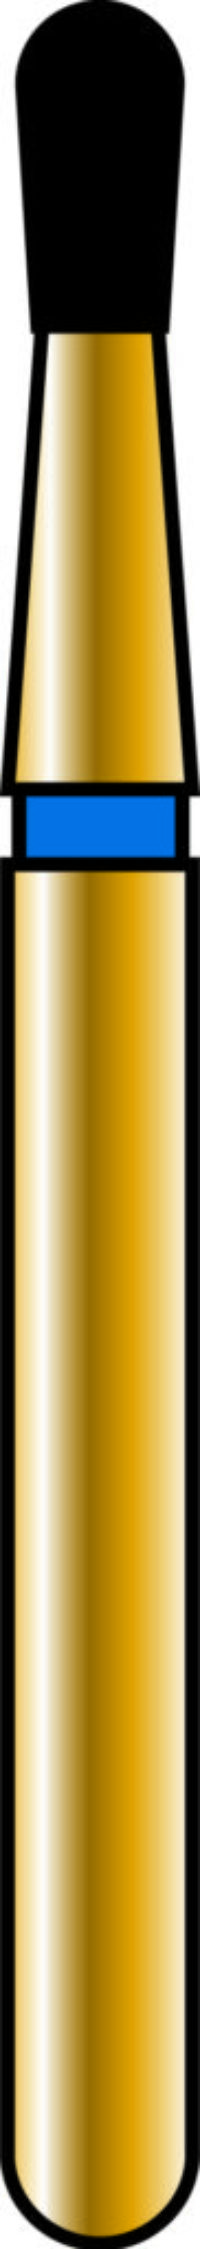 Pear 14-2.7mm Gold Diamond Bur